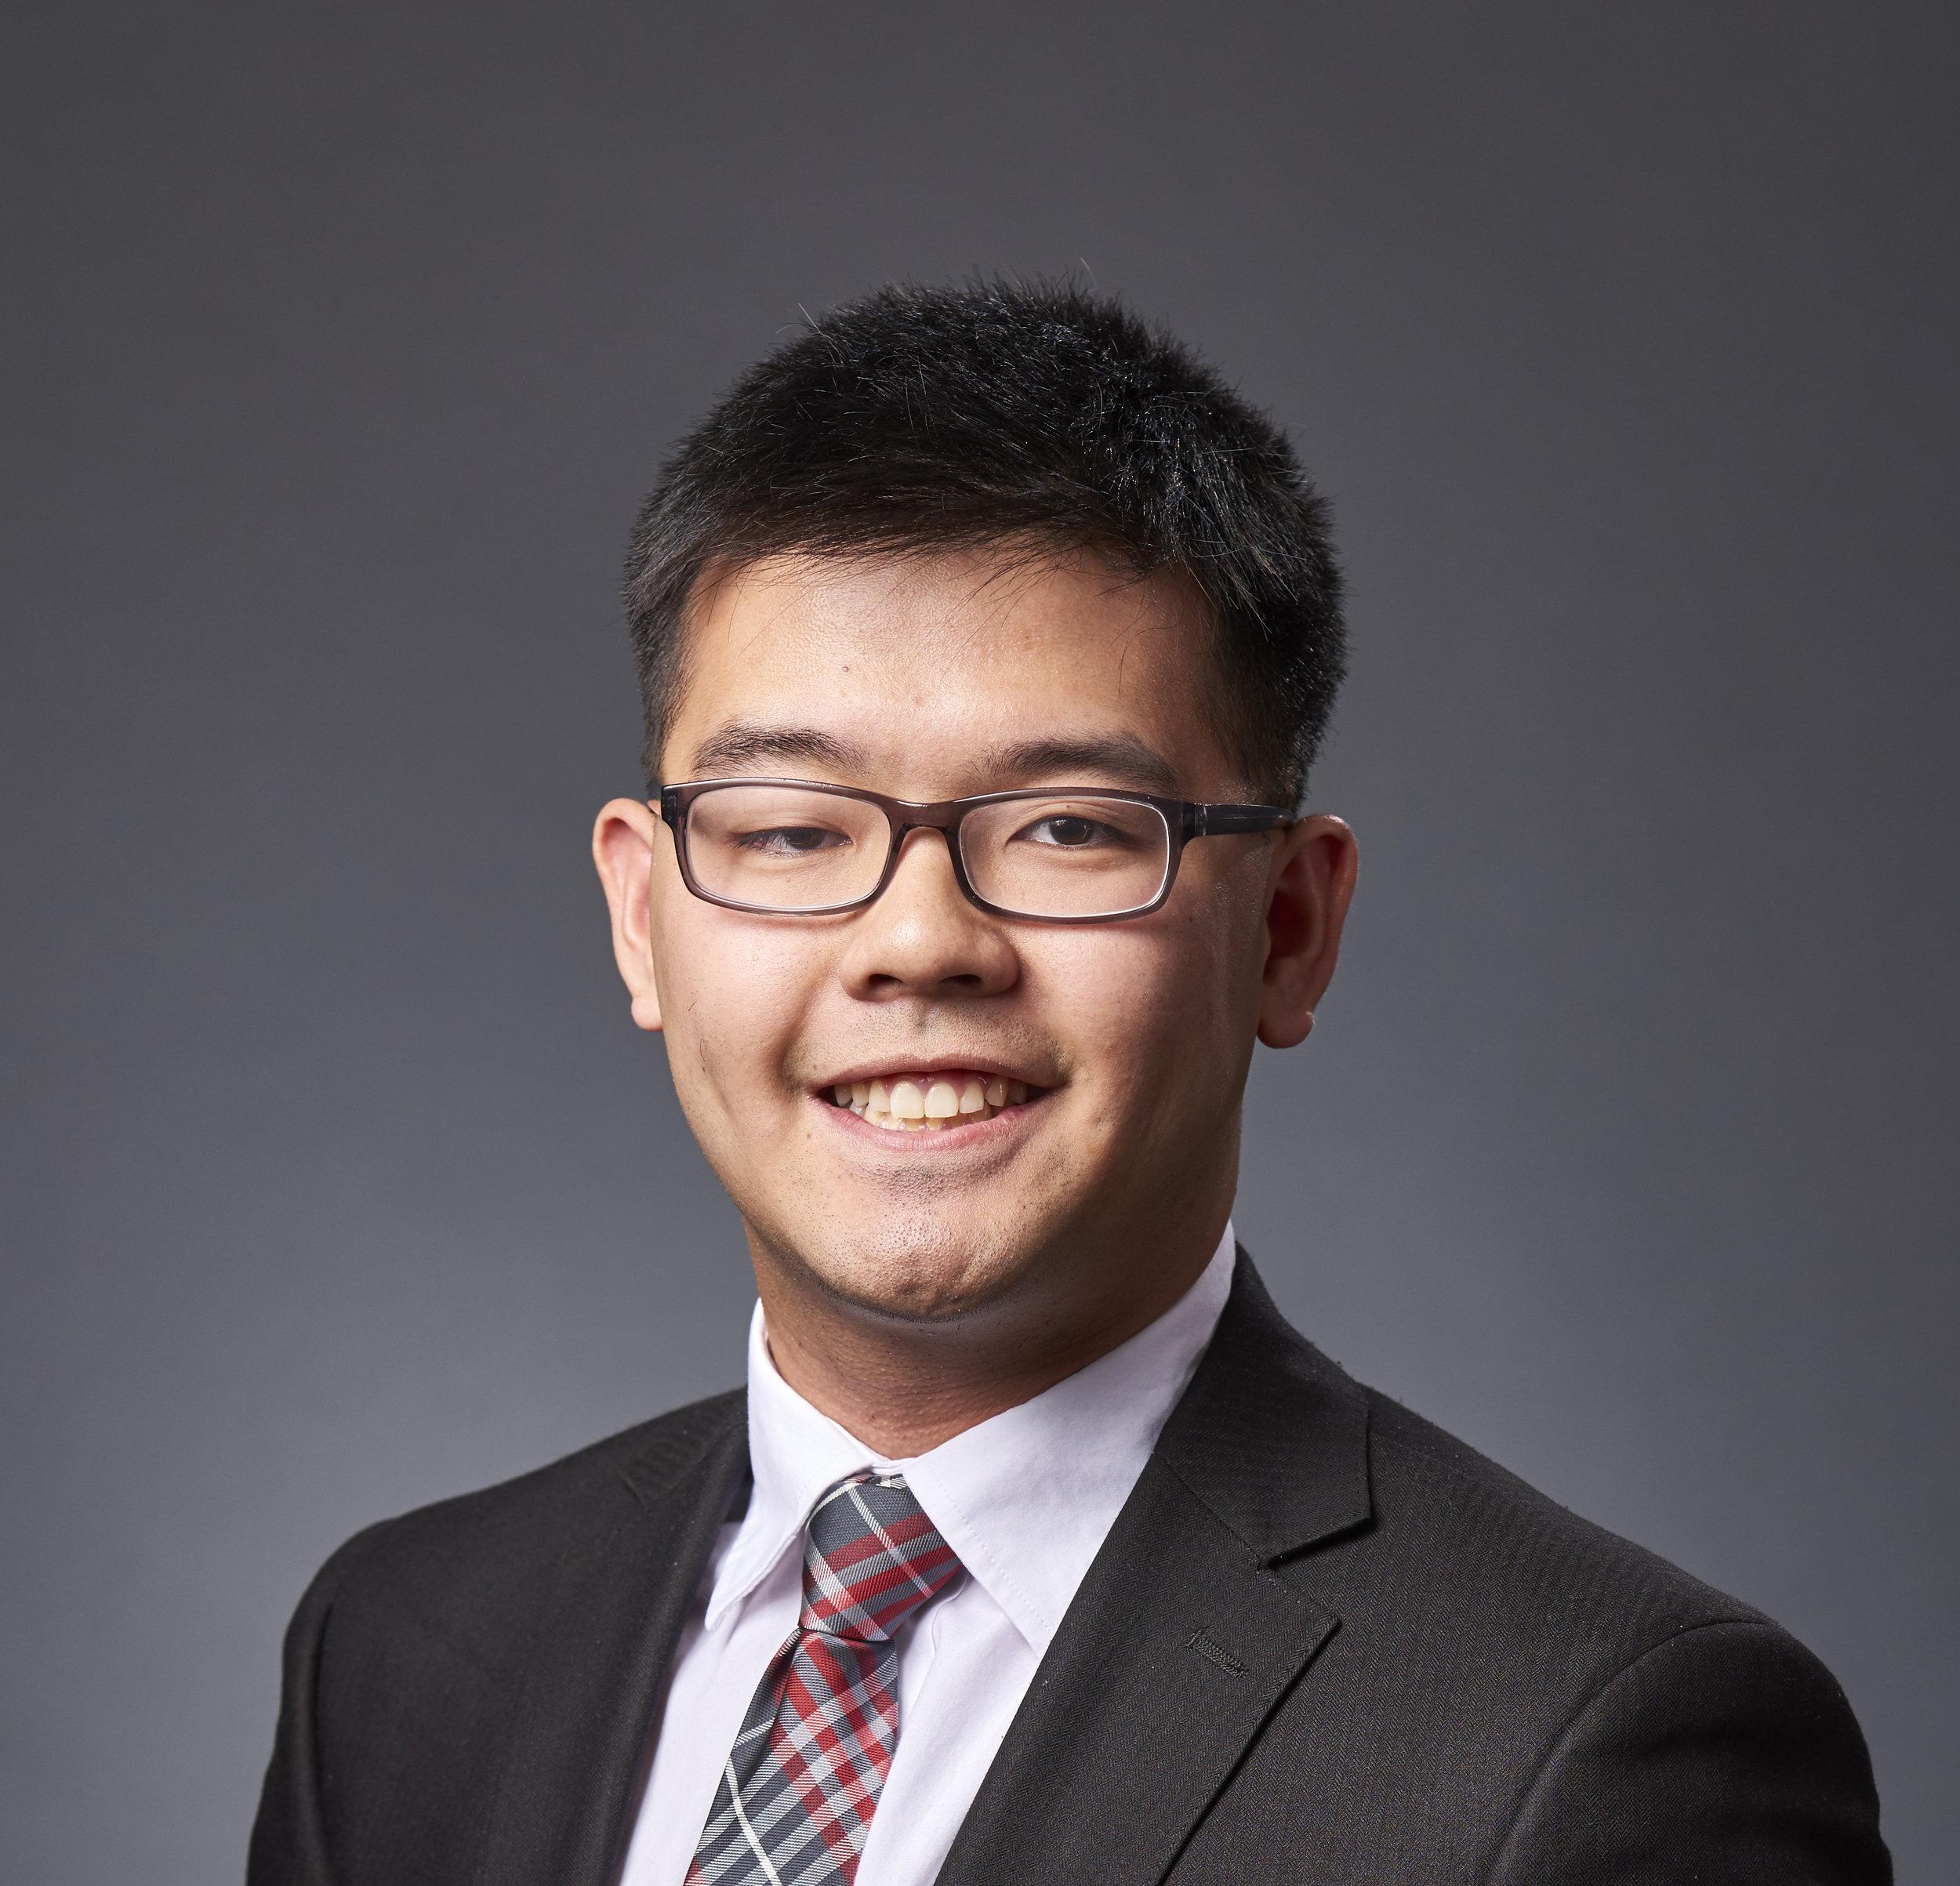 "<p><strong> Alvin Tsang </strong> Policy Innovation <a href=""/alvin-tsang"">More →</a></p>"